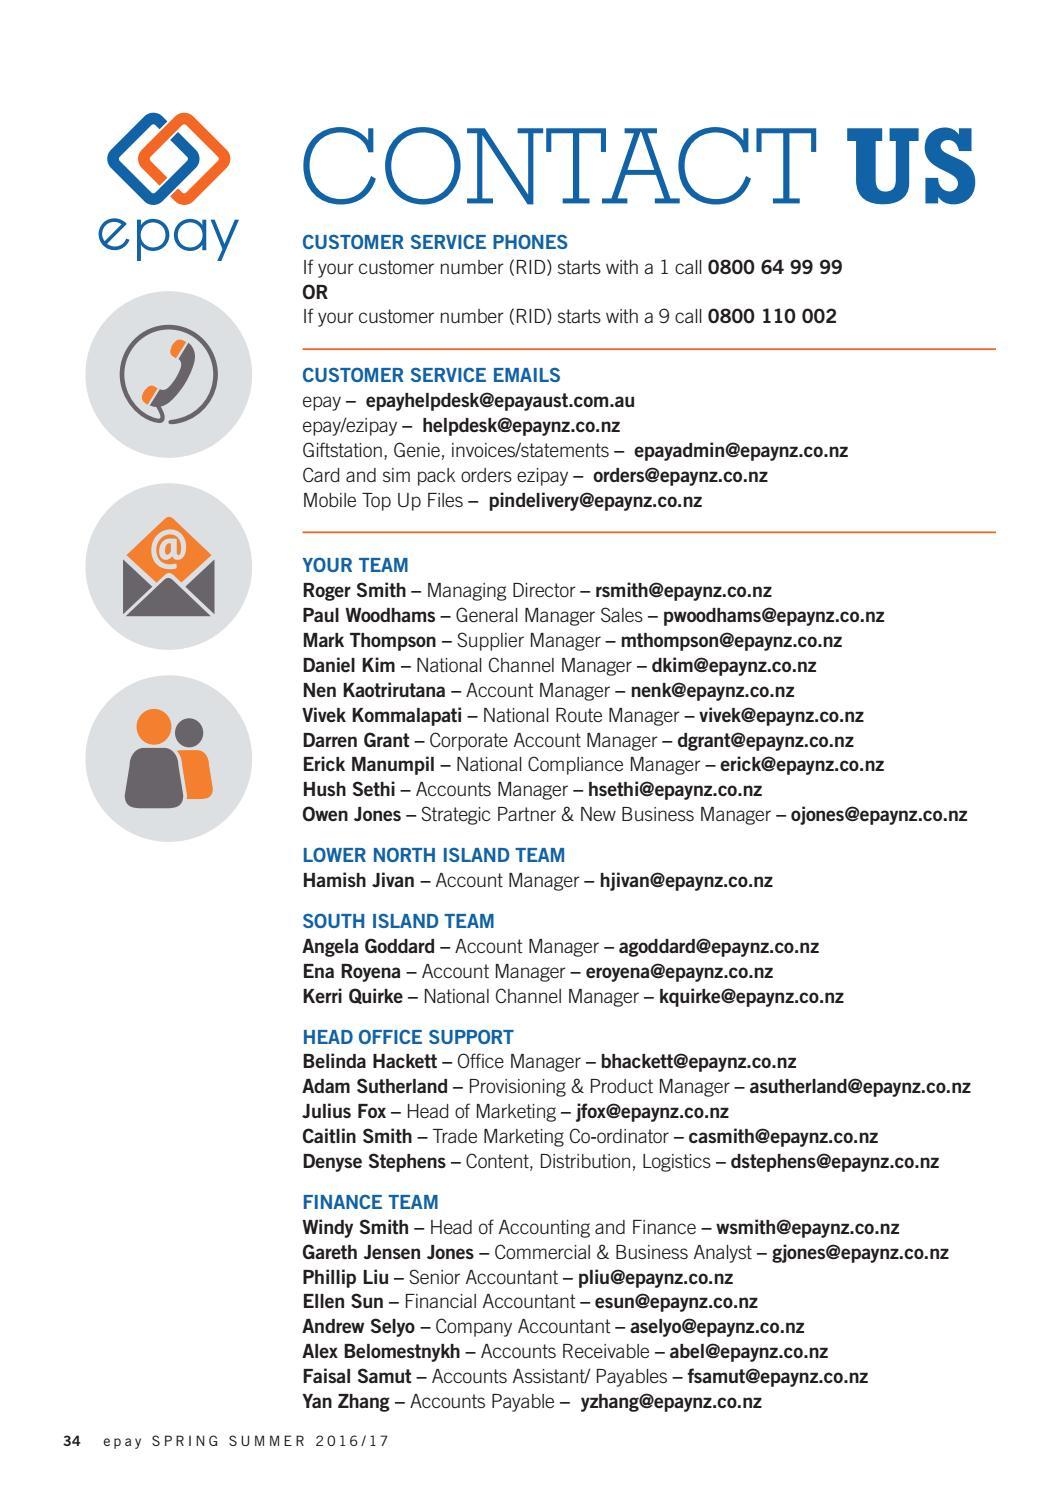 epay world NZ spring-summer 2016-2017 by The Intermedia